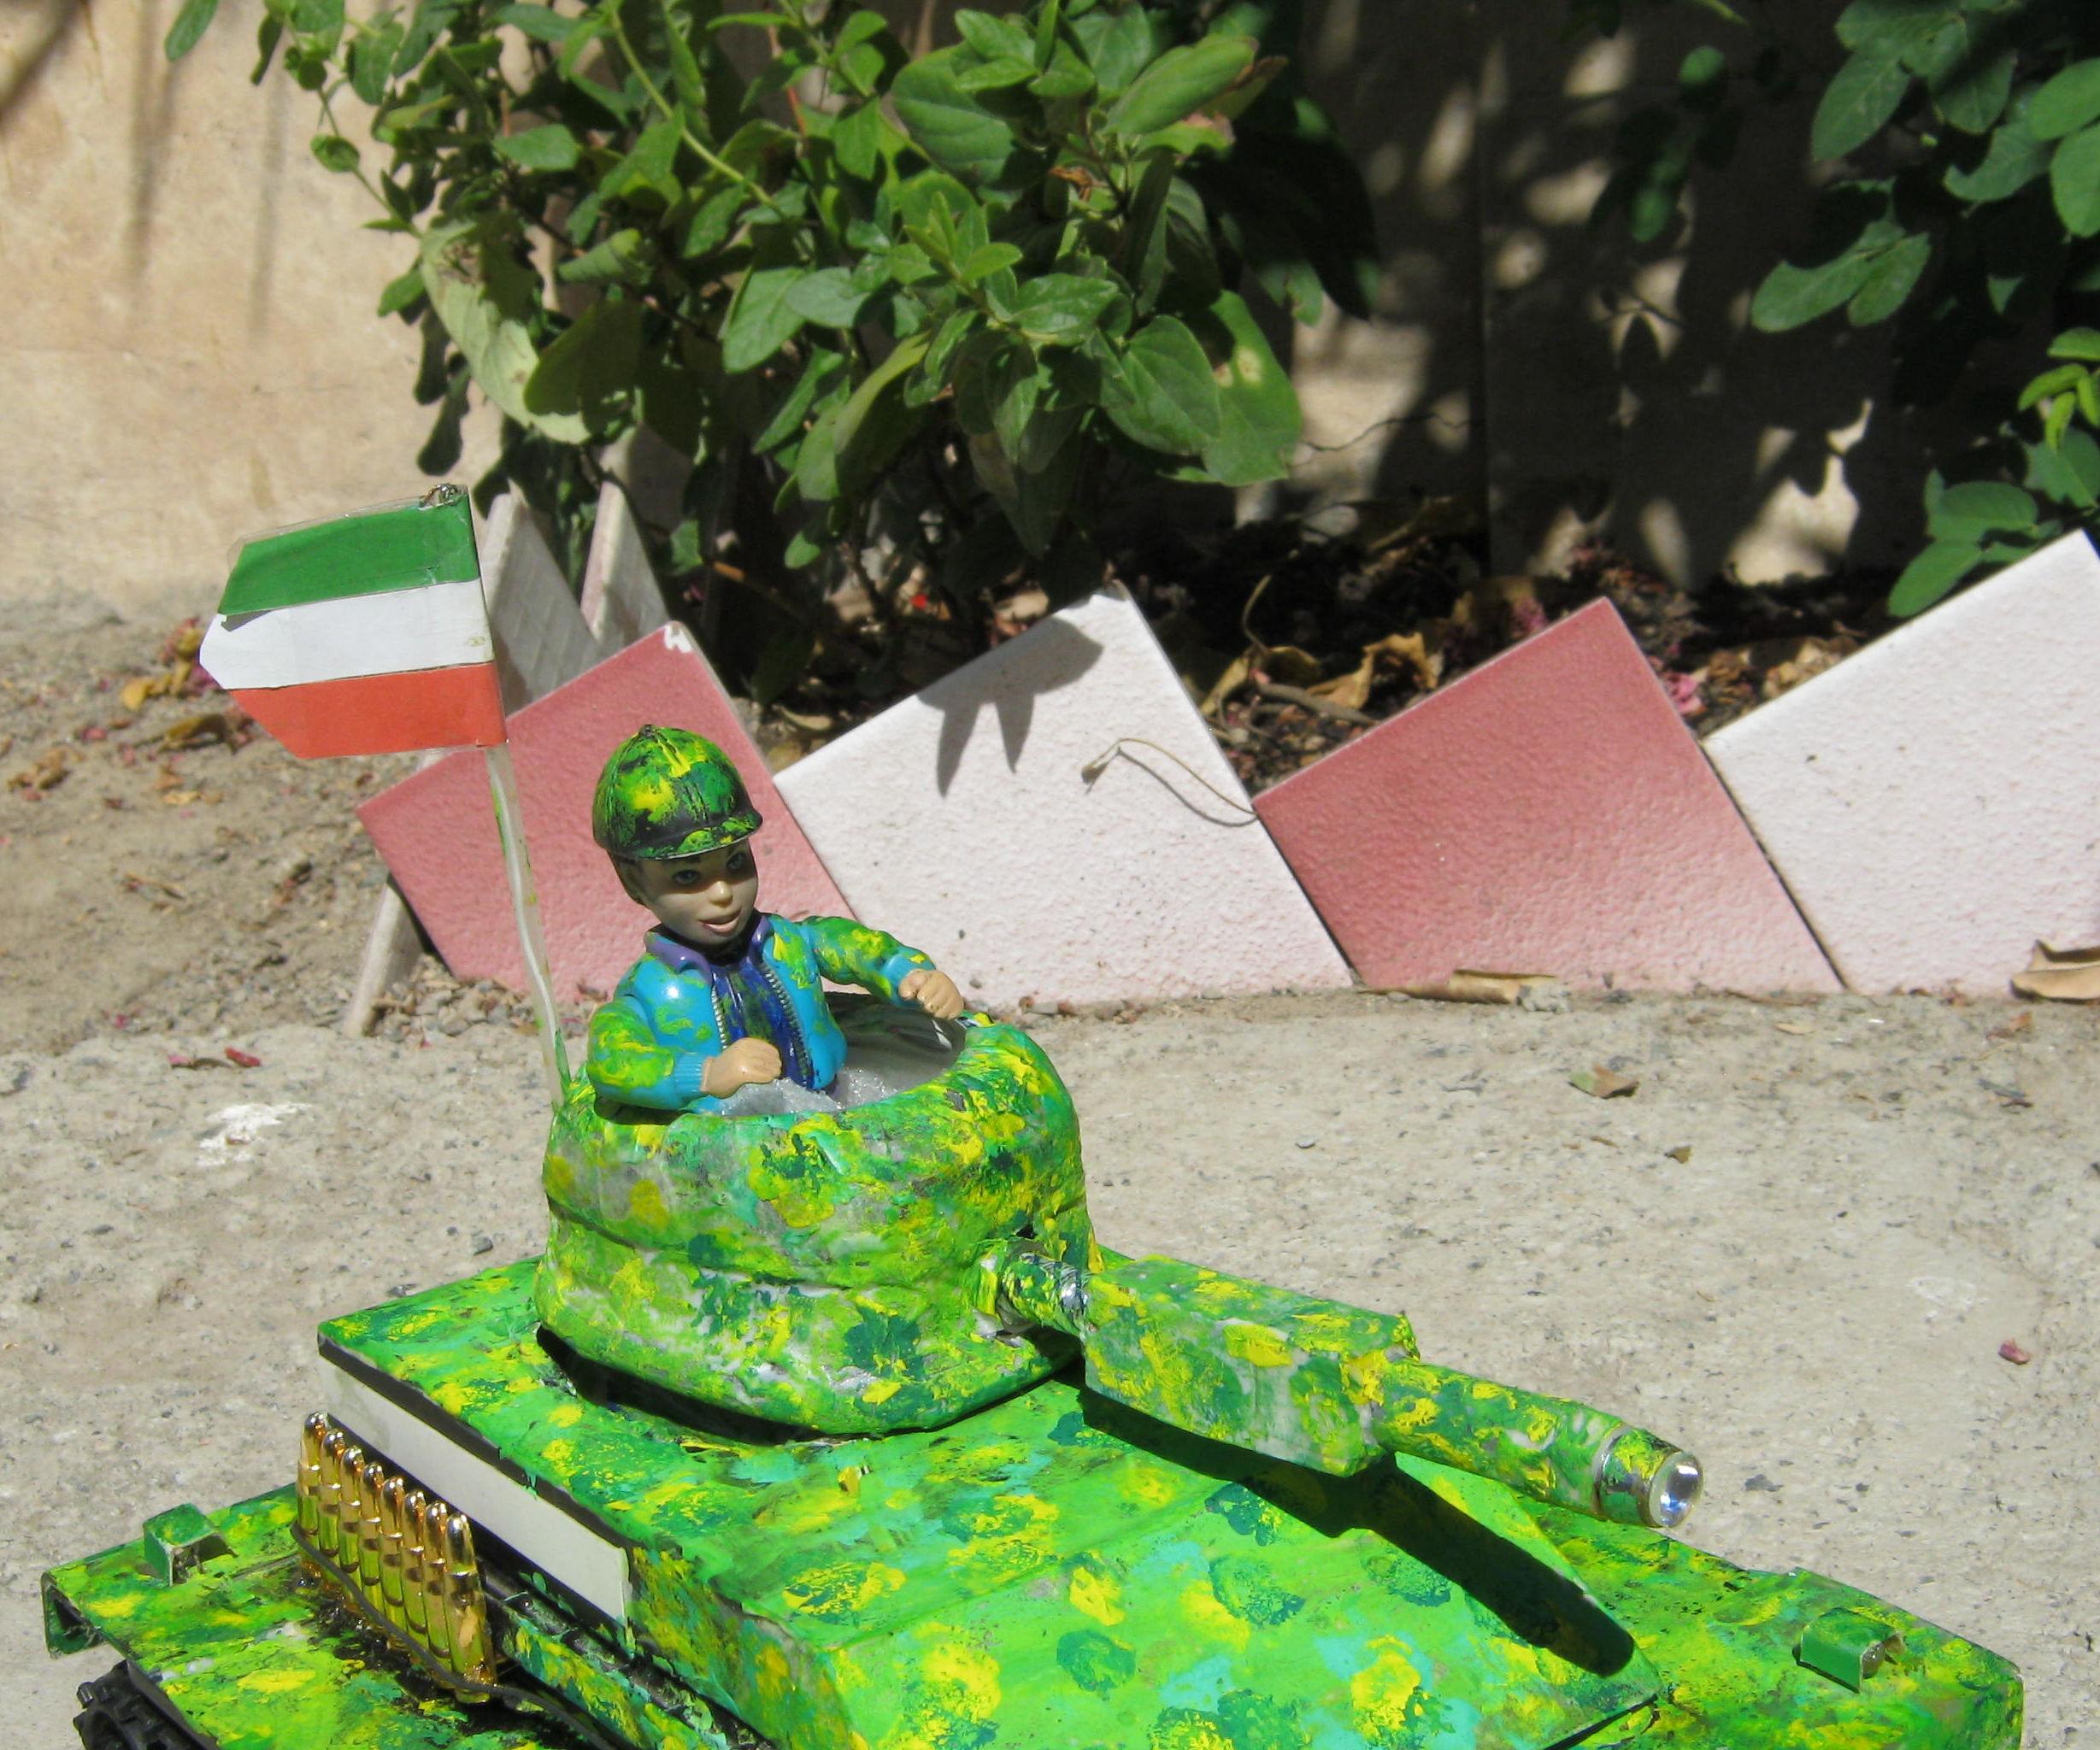 Tank With Laser Guns